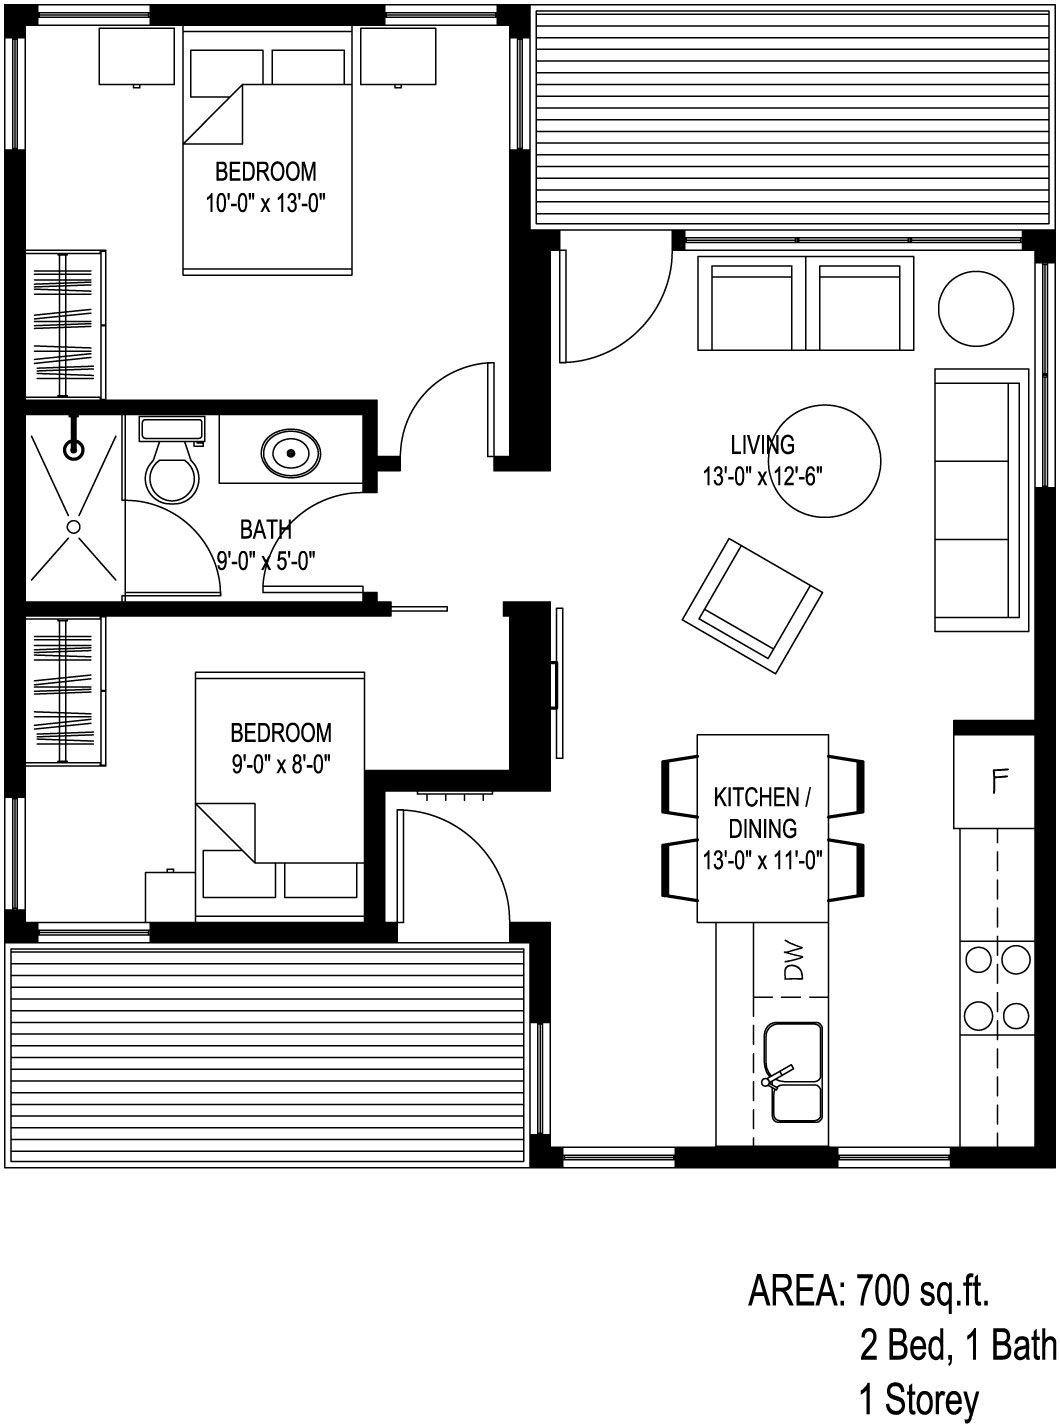 Small House Plans Under 700 Sq Ft 2020 Di 2021 Denah Rumah Denah Rumah Kecil Rumah Impian